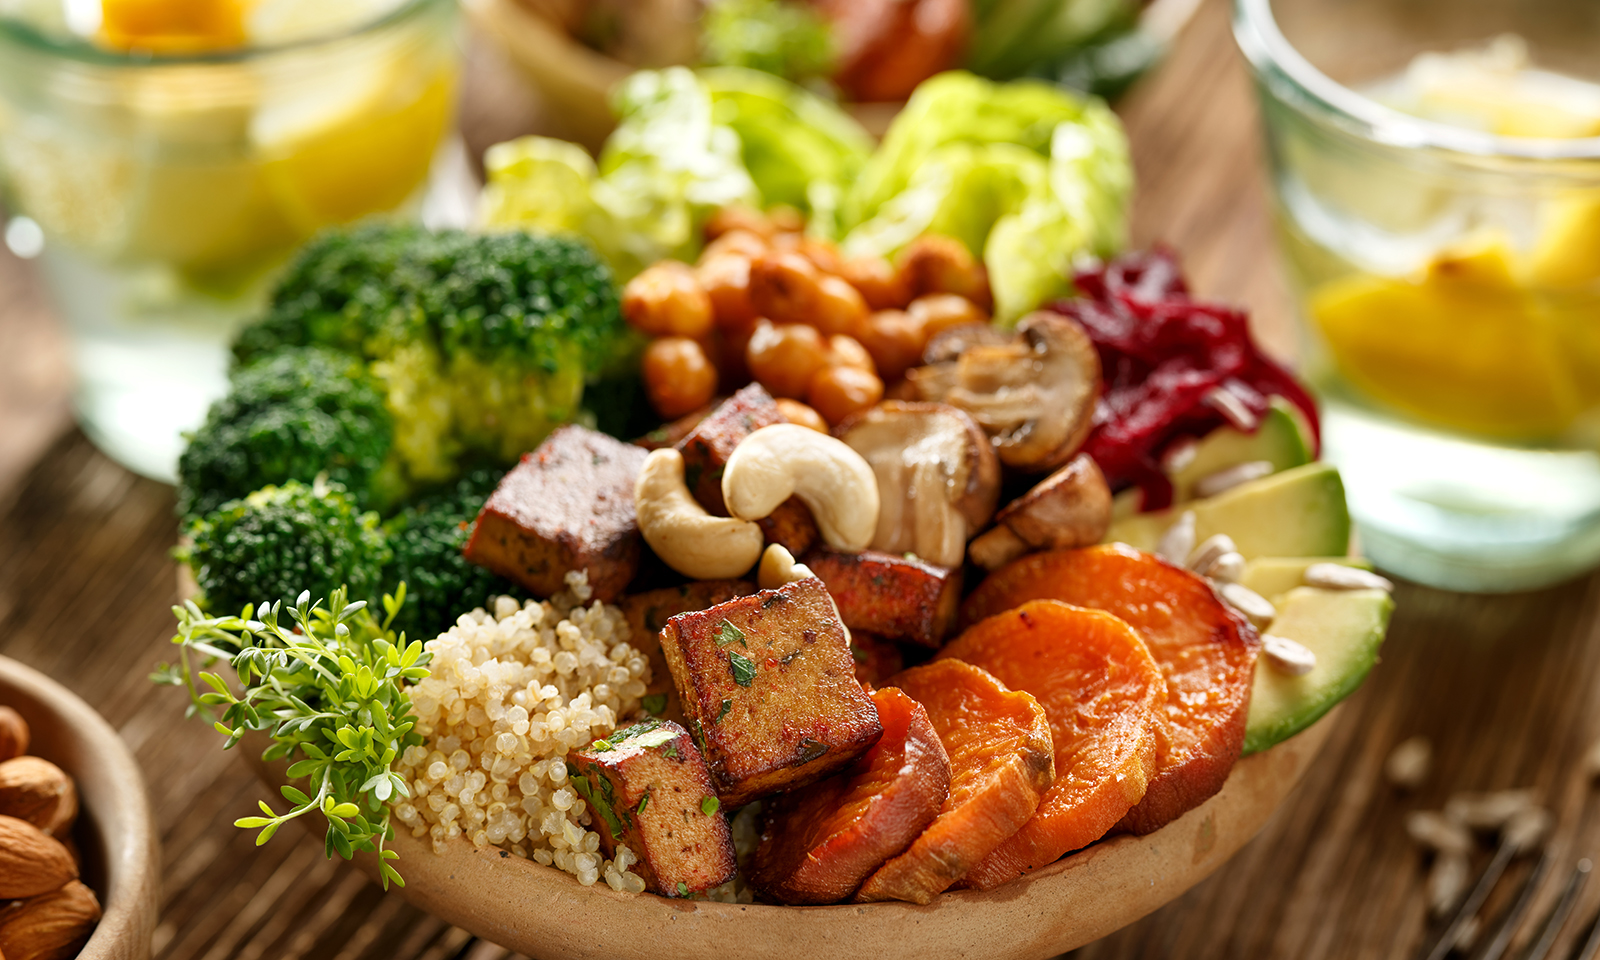 vegan-salad-cous-cous-quinoa-brocolli-avocado-mushroom-crouton-cashews